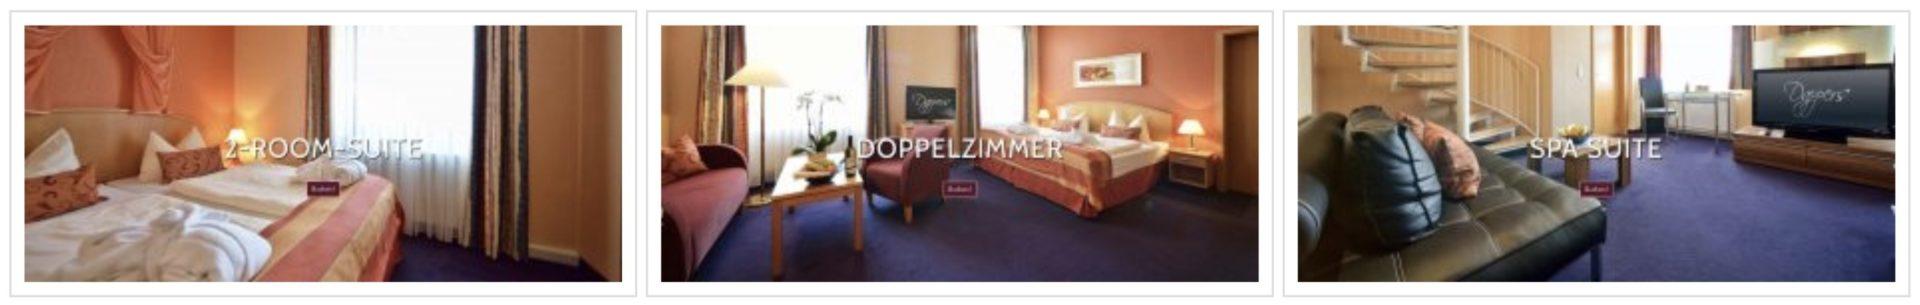 Dappers Hotel Bad Kissingen Zimmer